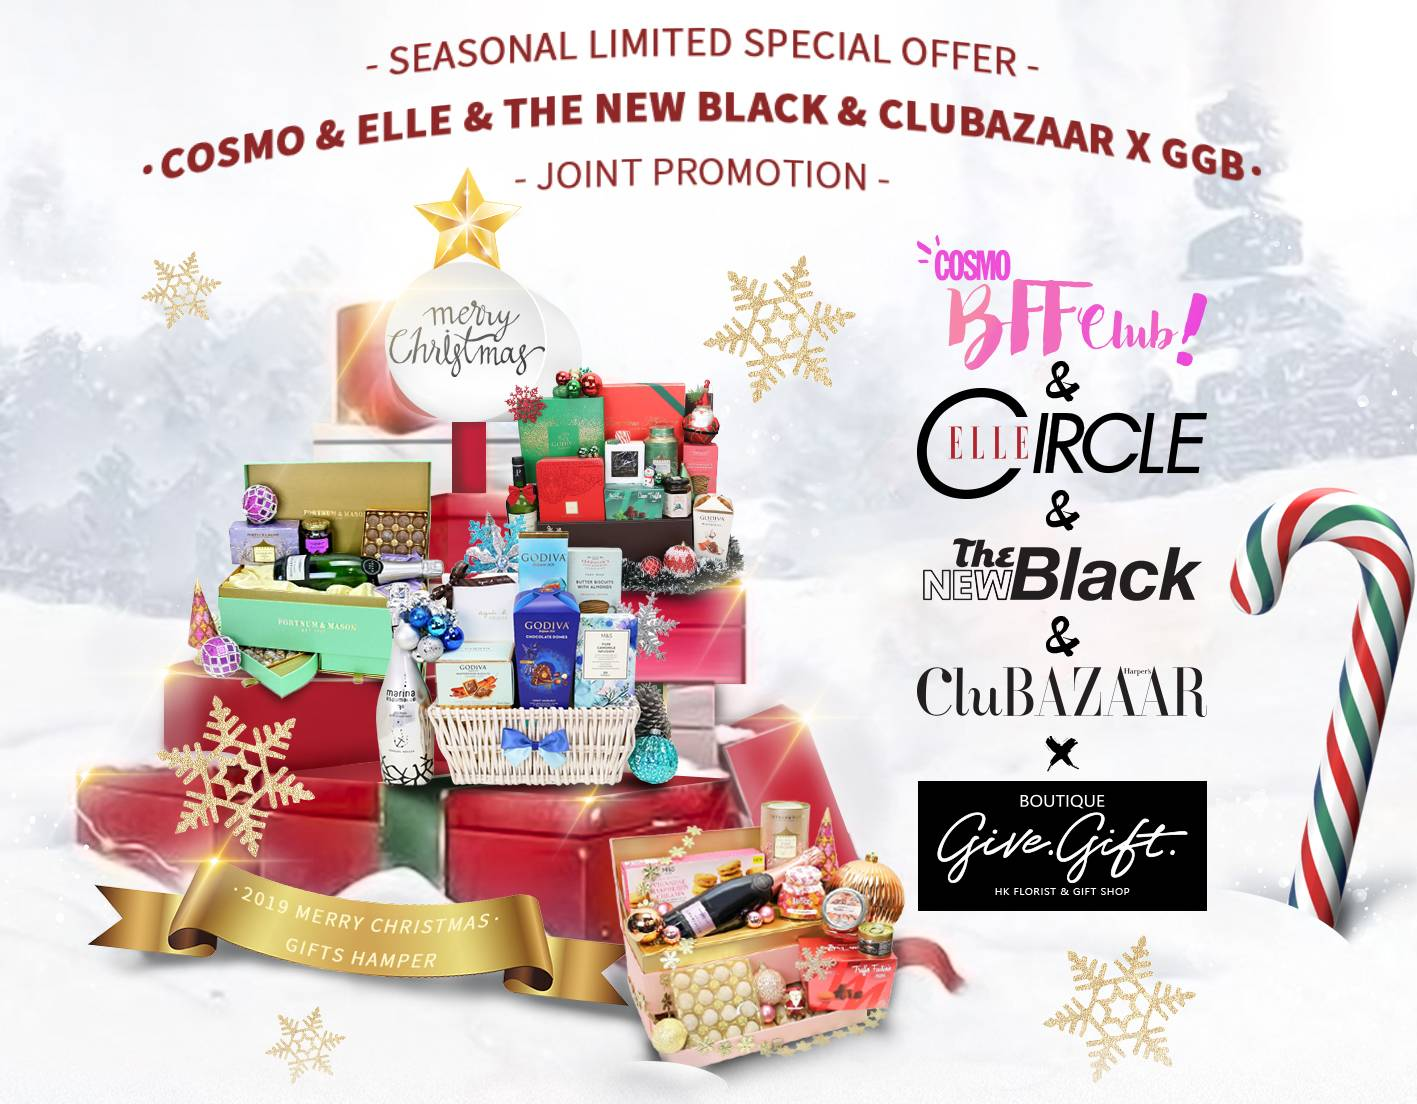 2019 Elle X Cosmopolitan X The New Black X Ggb Limited Hong Kong Christmas Gifts